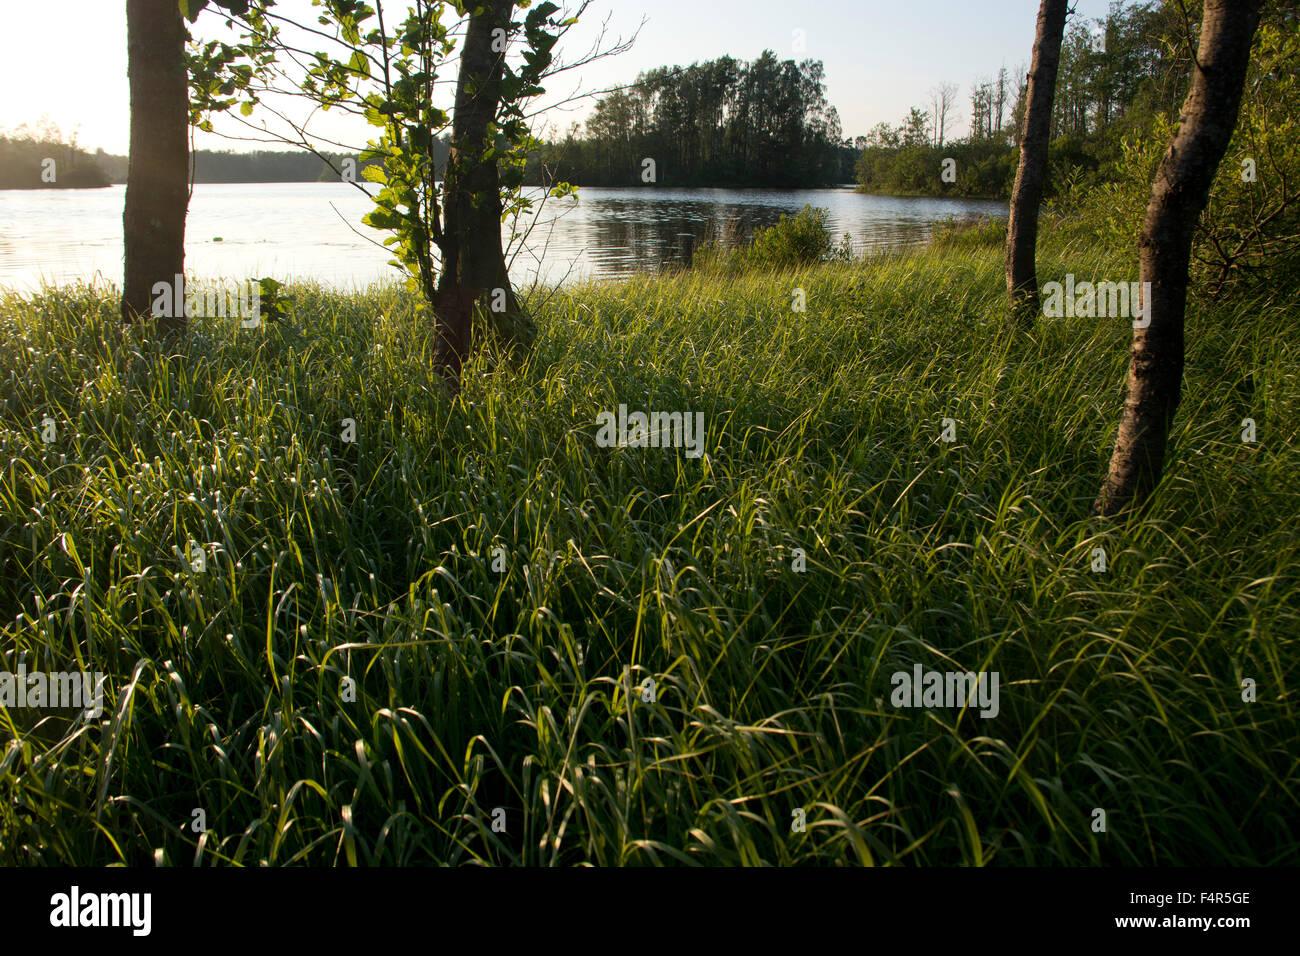 Sweden, Europe, Skane, Örkeljunga, Store Sjö, lake, shore, trees, summer, islands, reed, grass - Stock Image